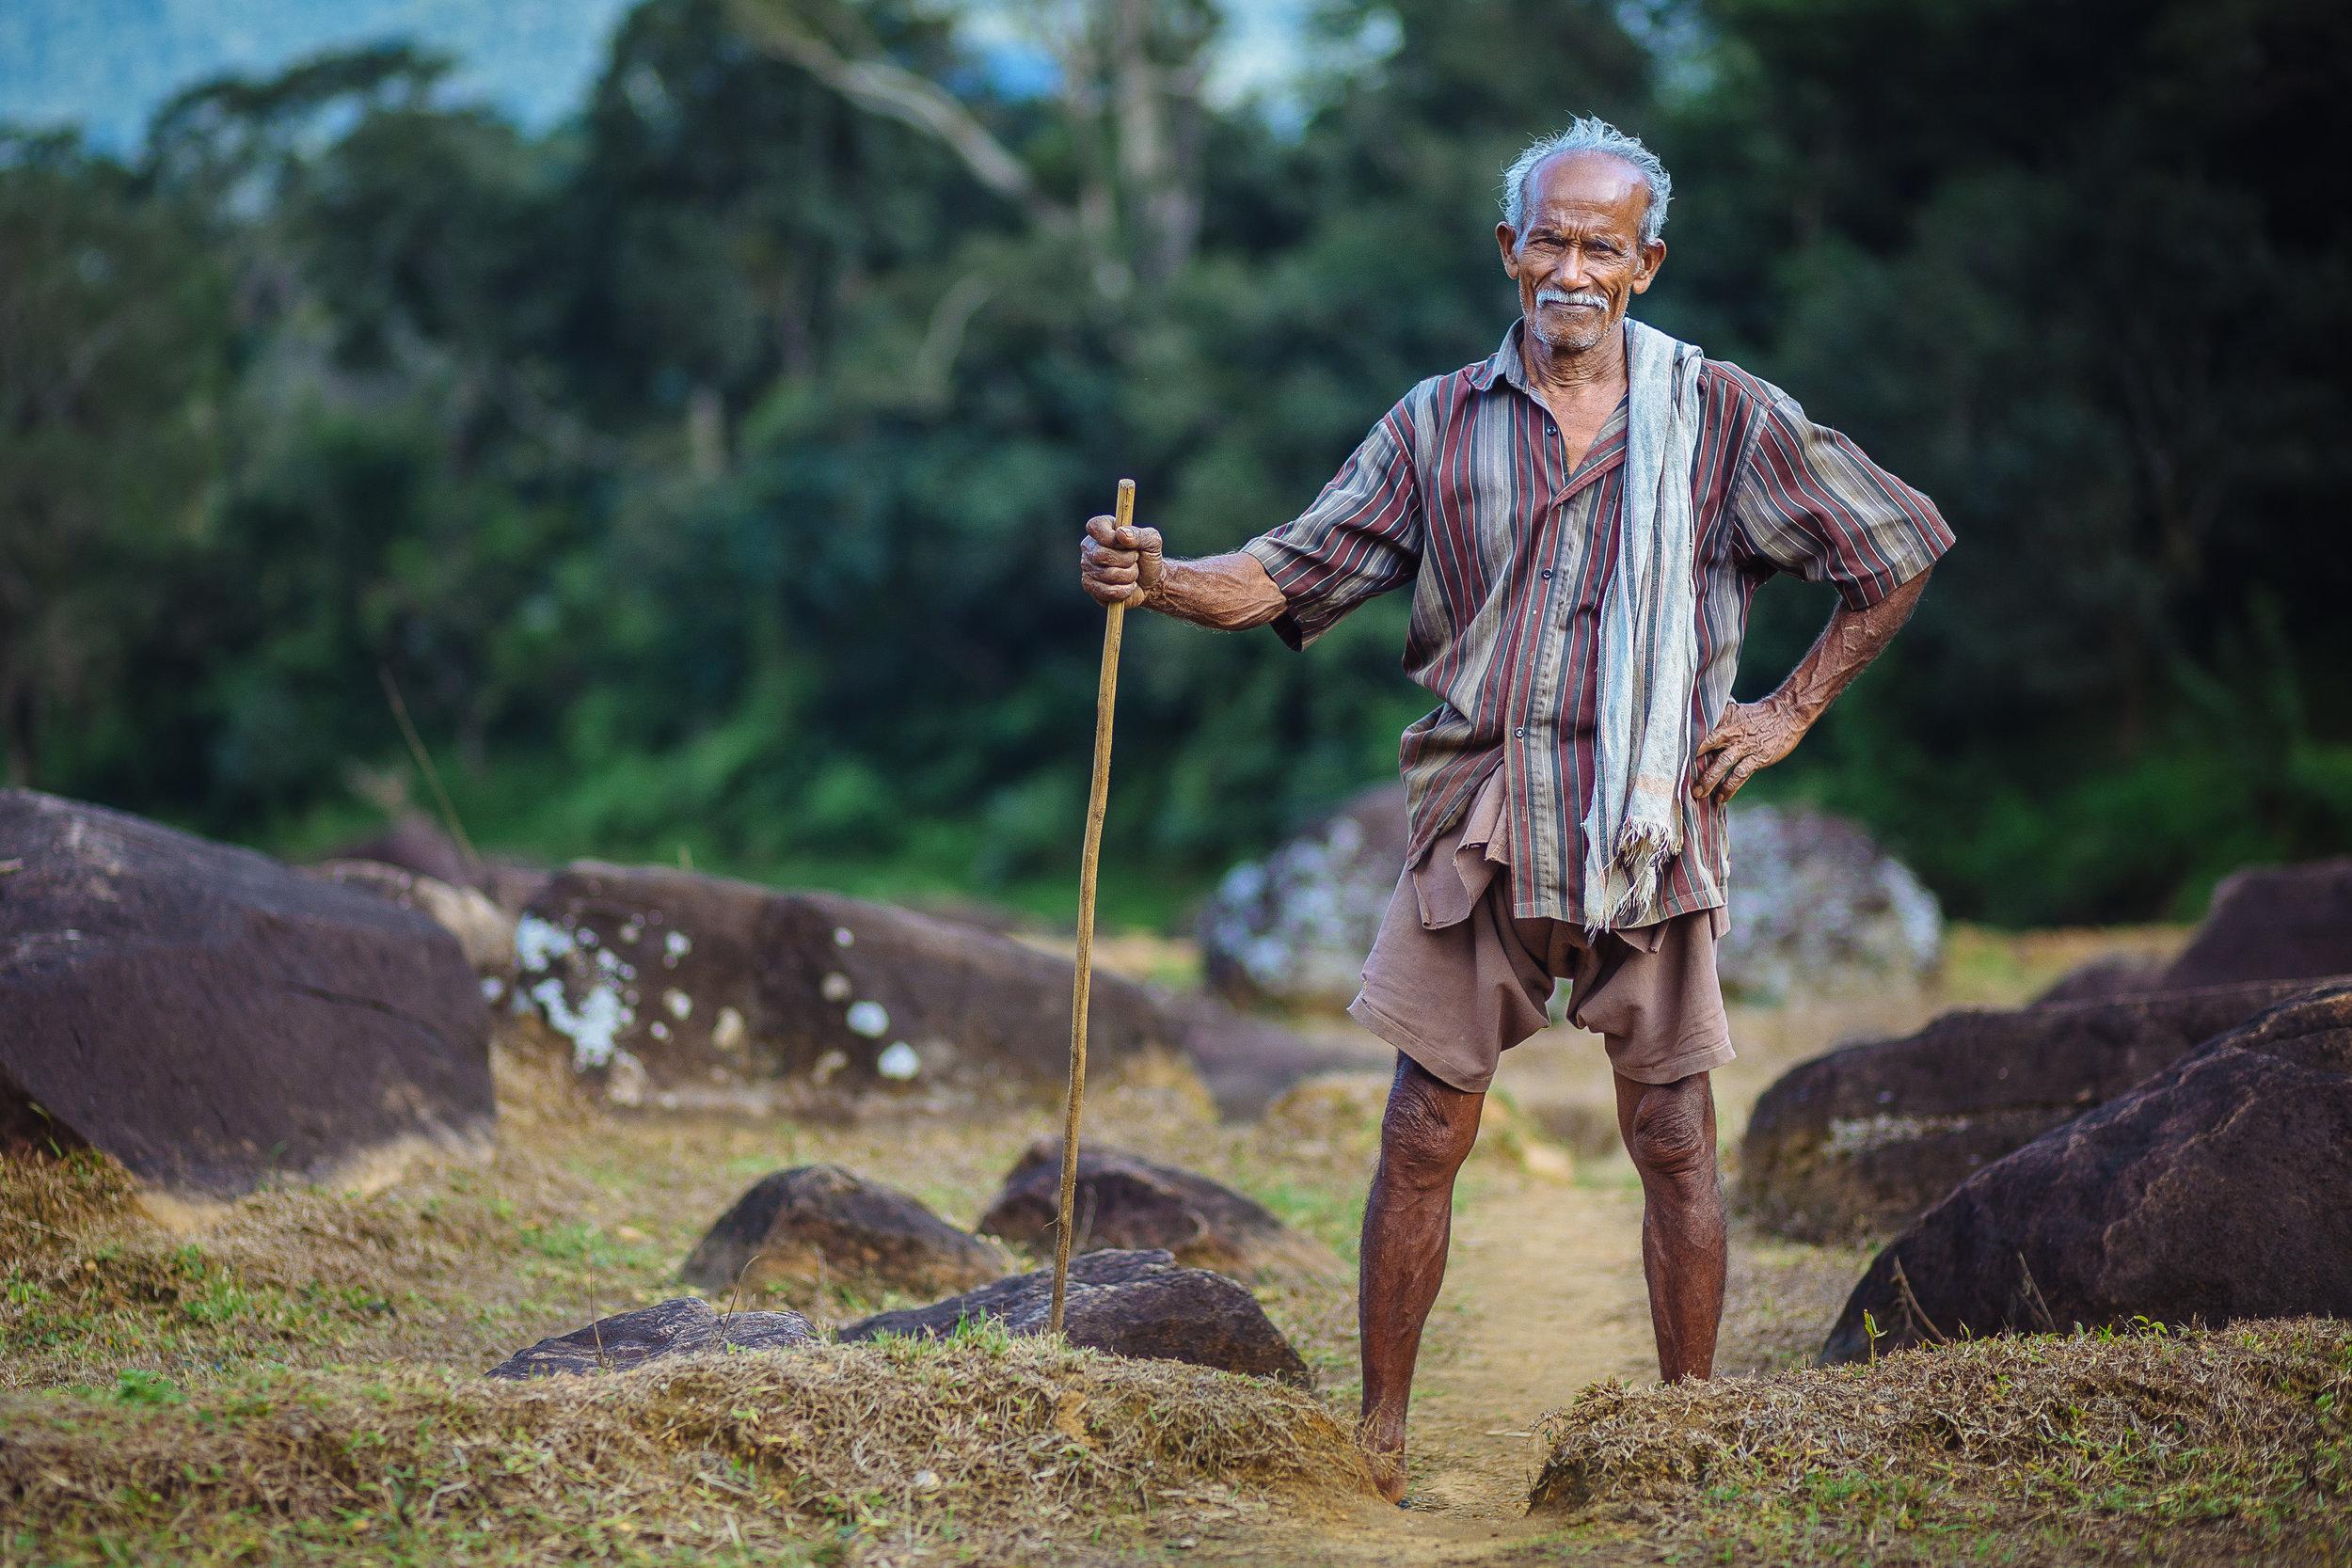 Farmer in Meemure, a rural village deep inside the knuckles moun